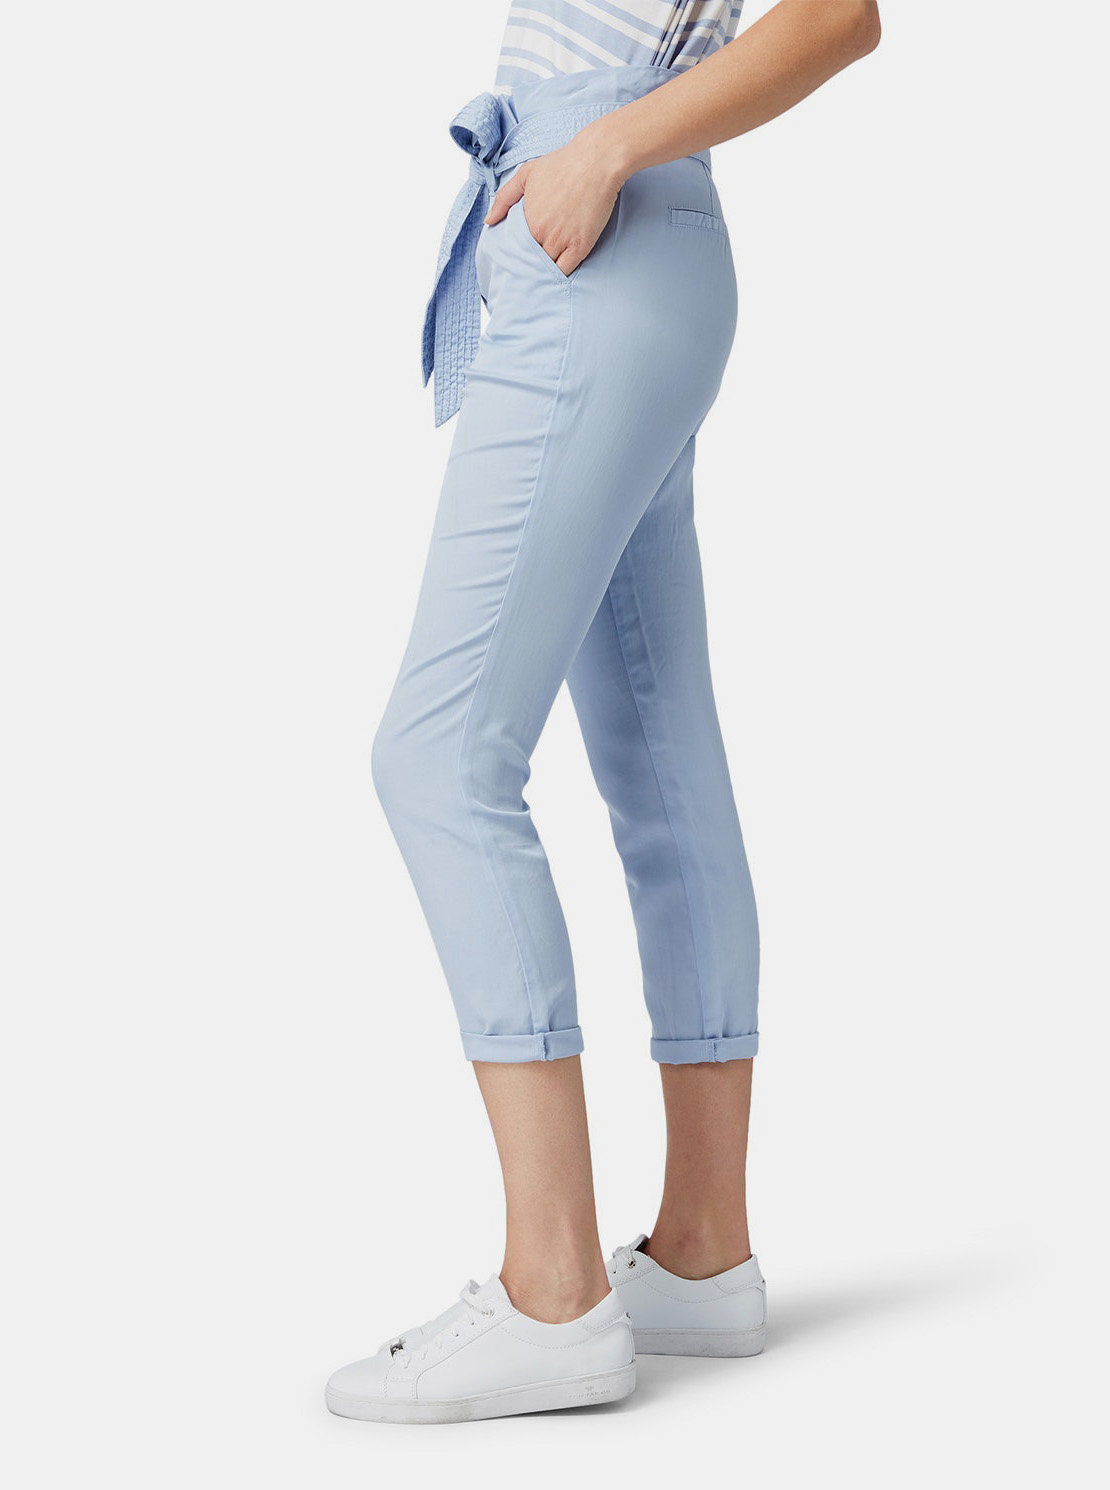 7579ac9a17de Modré dámske skrátené nohavice Tom Tailor ...